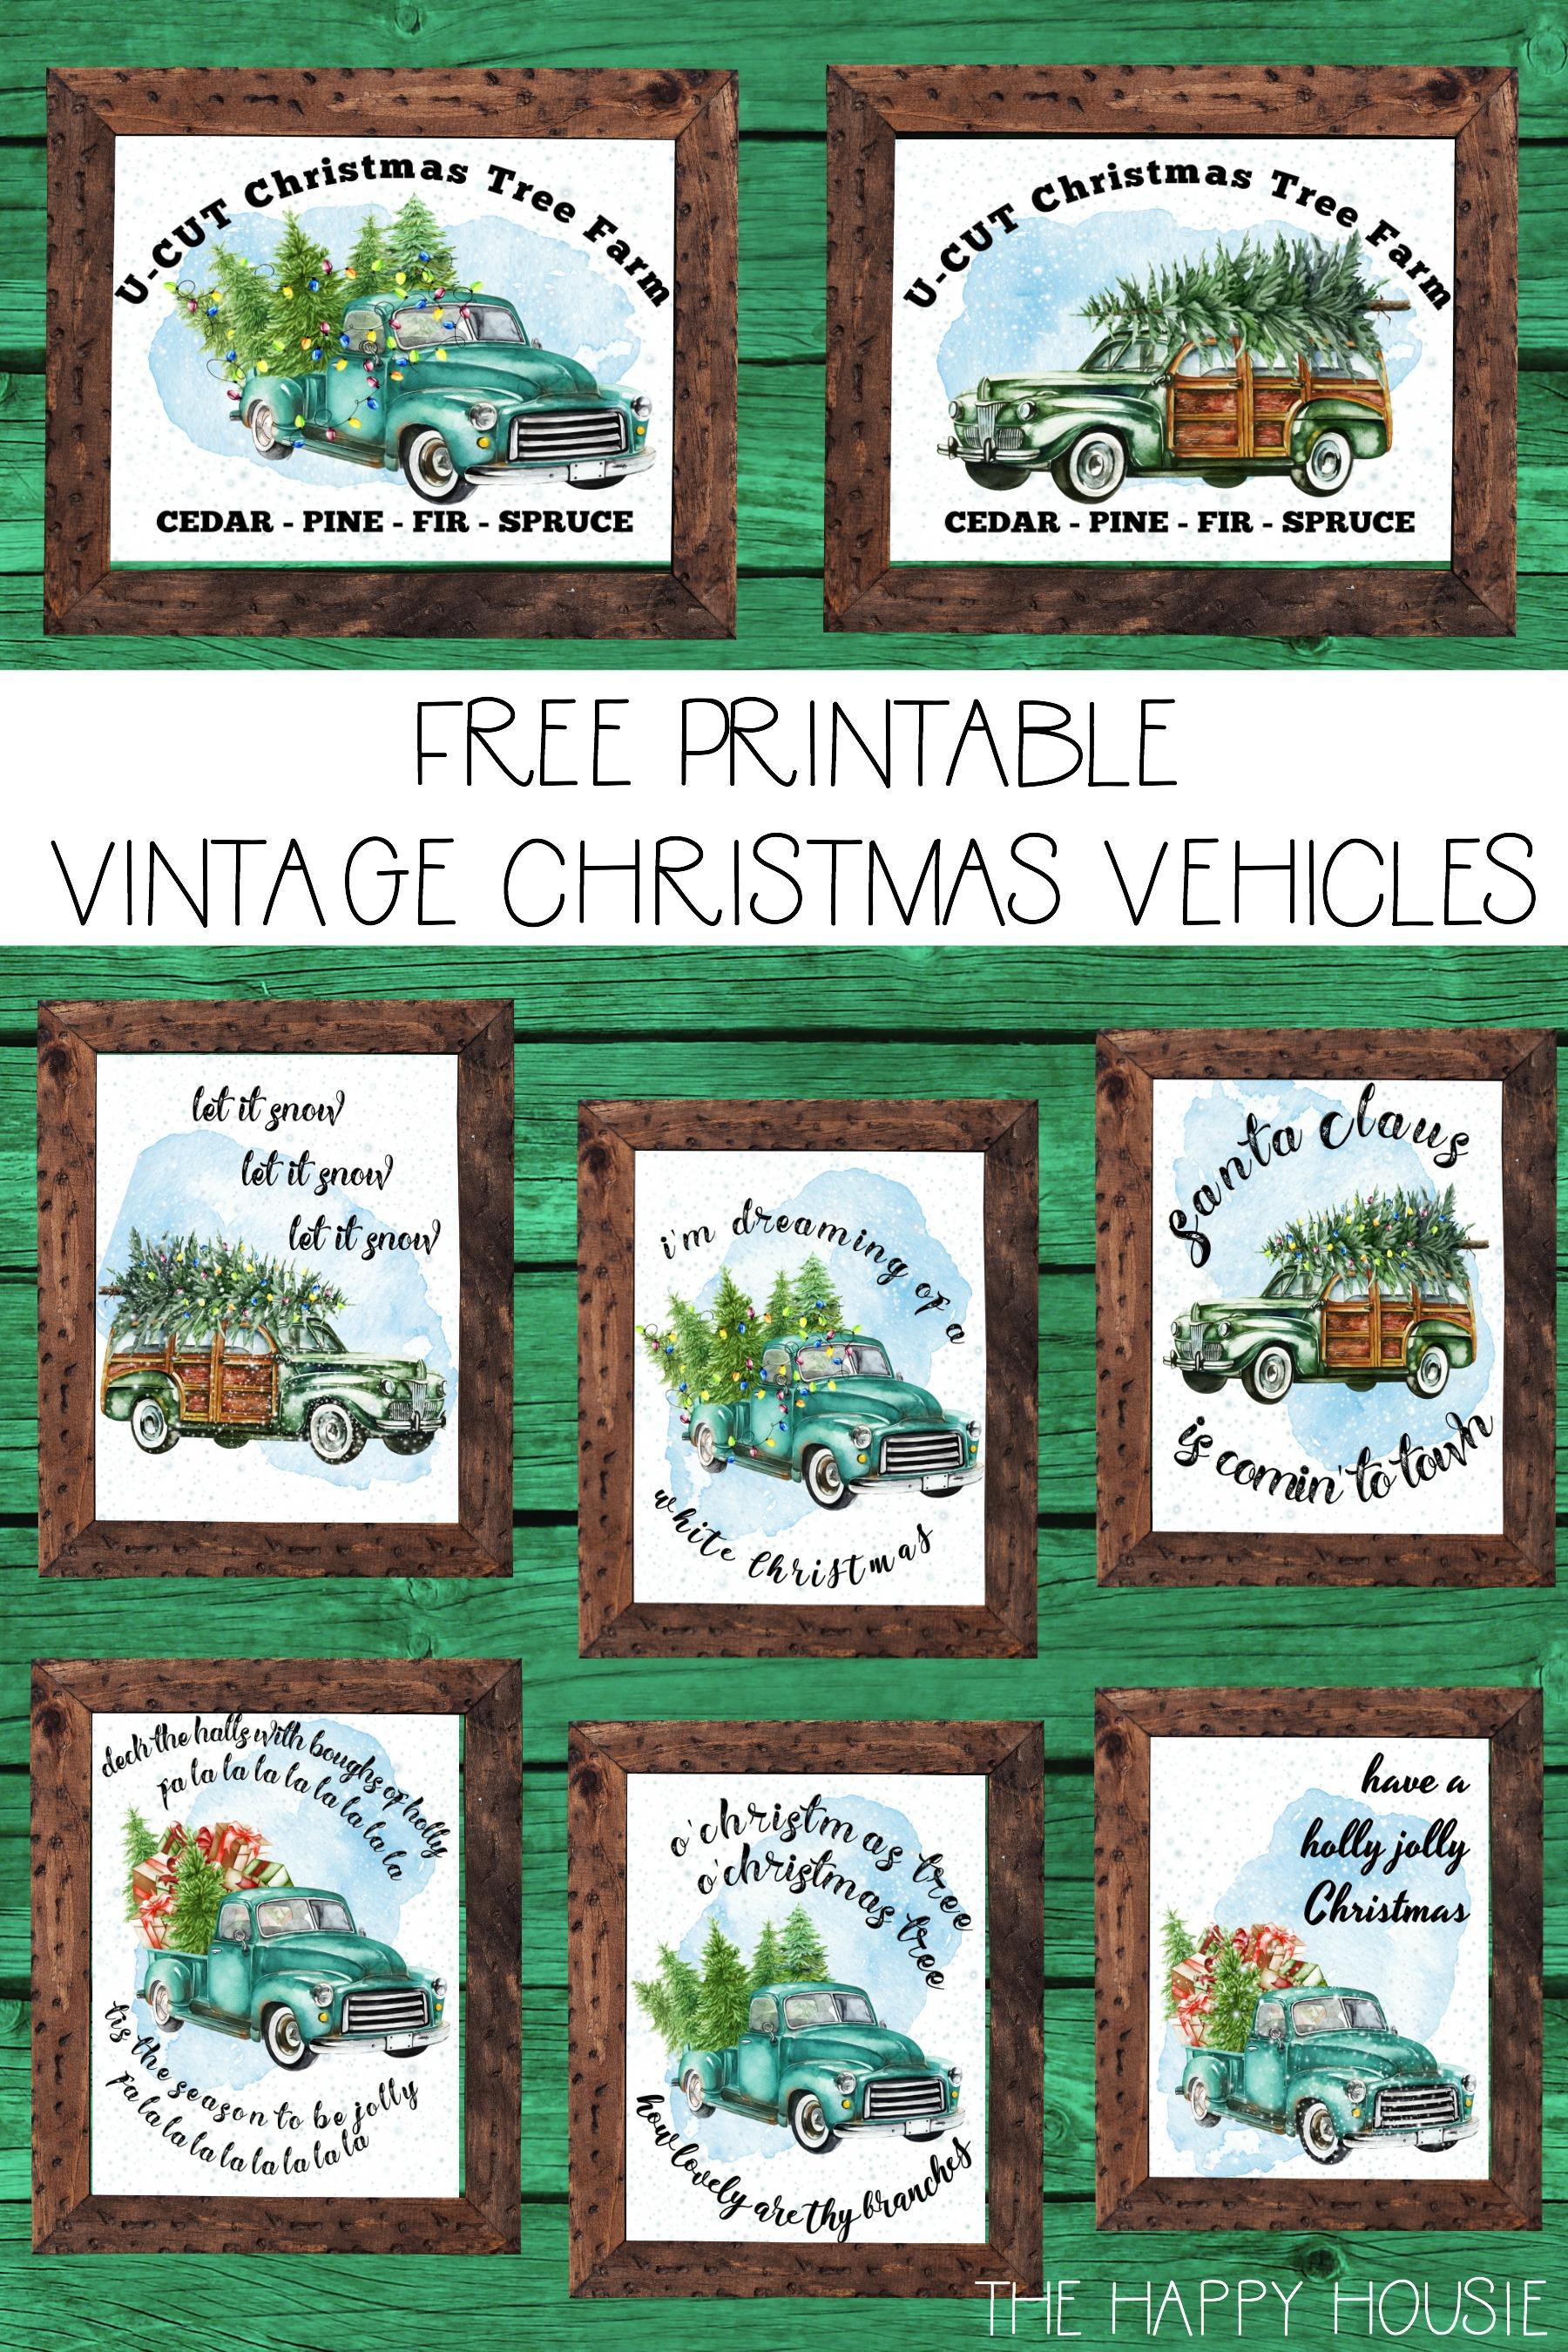 Free Printable Vintage Christmas Trucks The Happy Housie